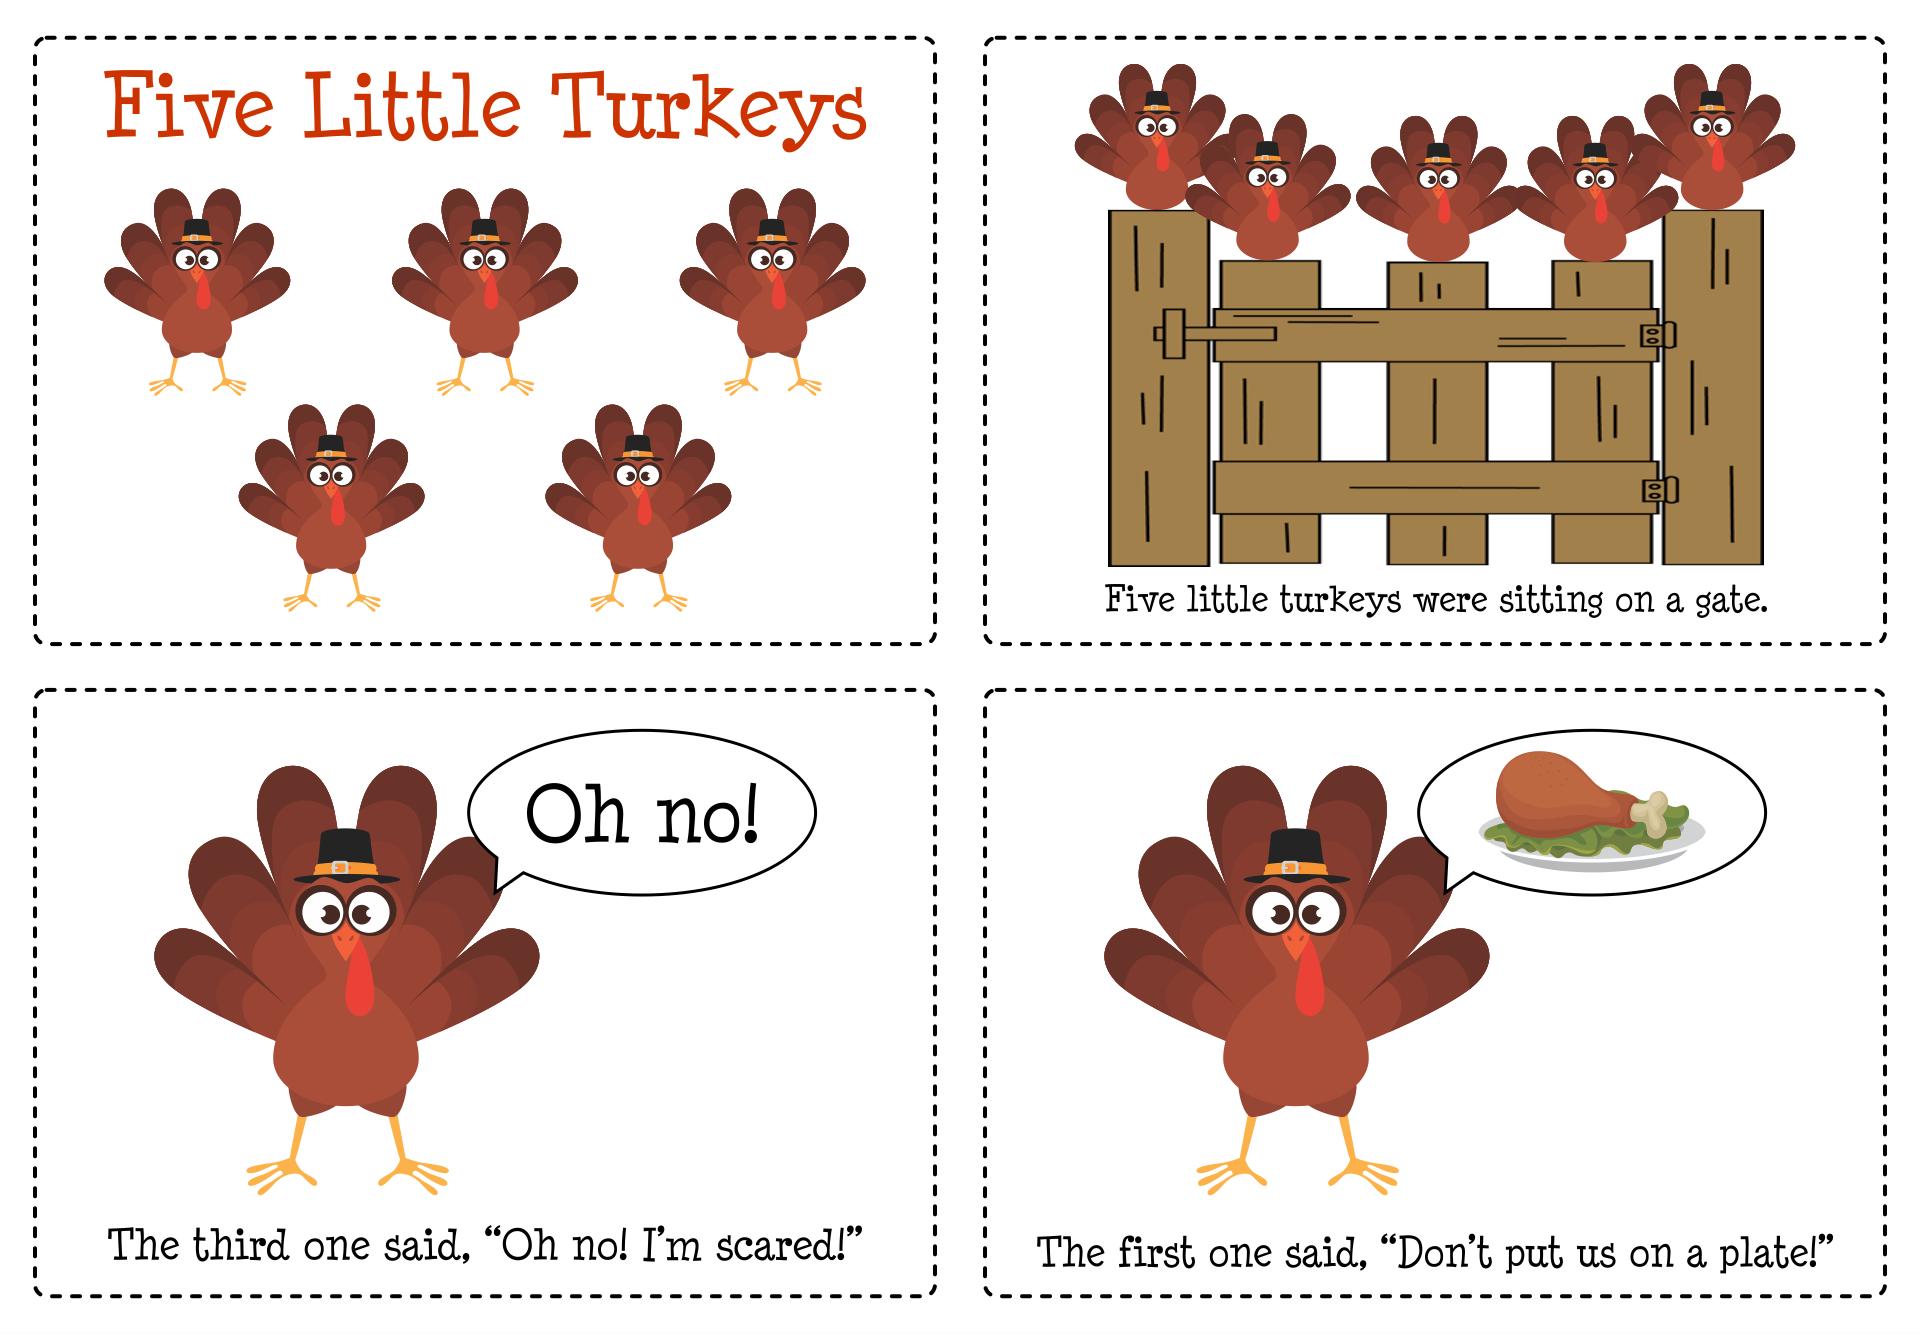 5 Little Turkeys Printable Book